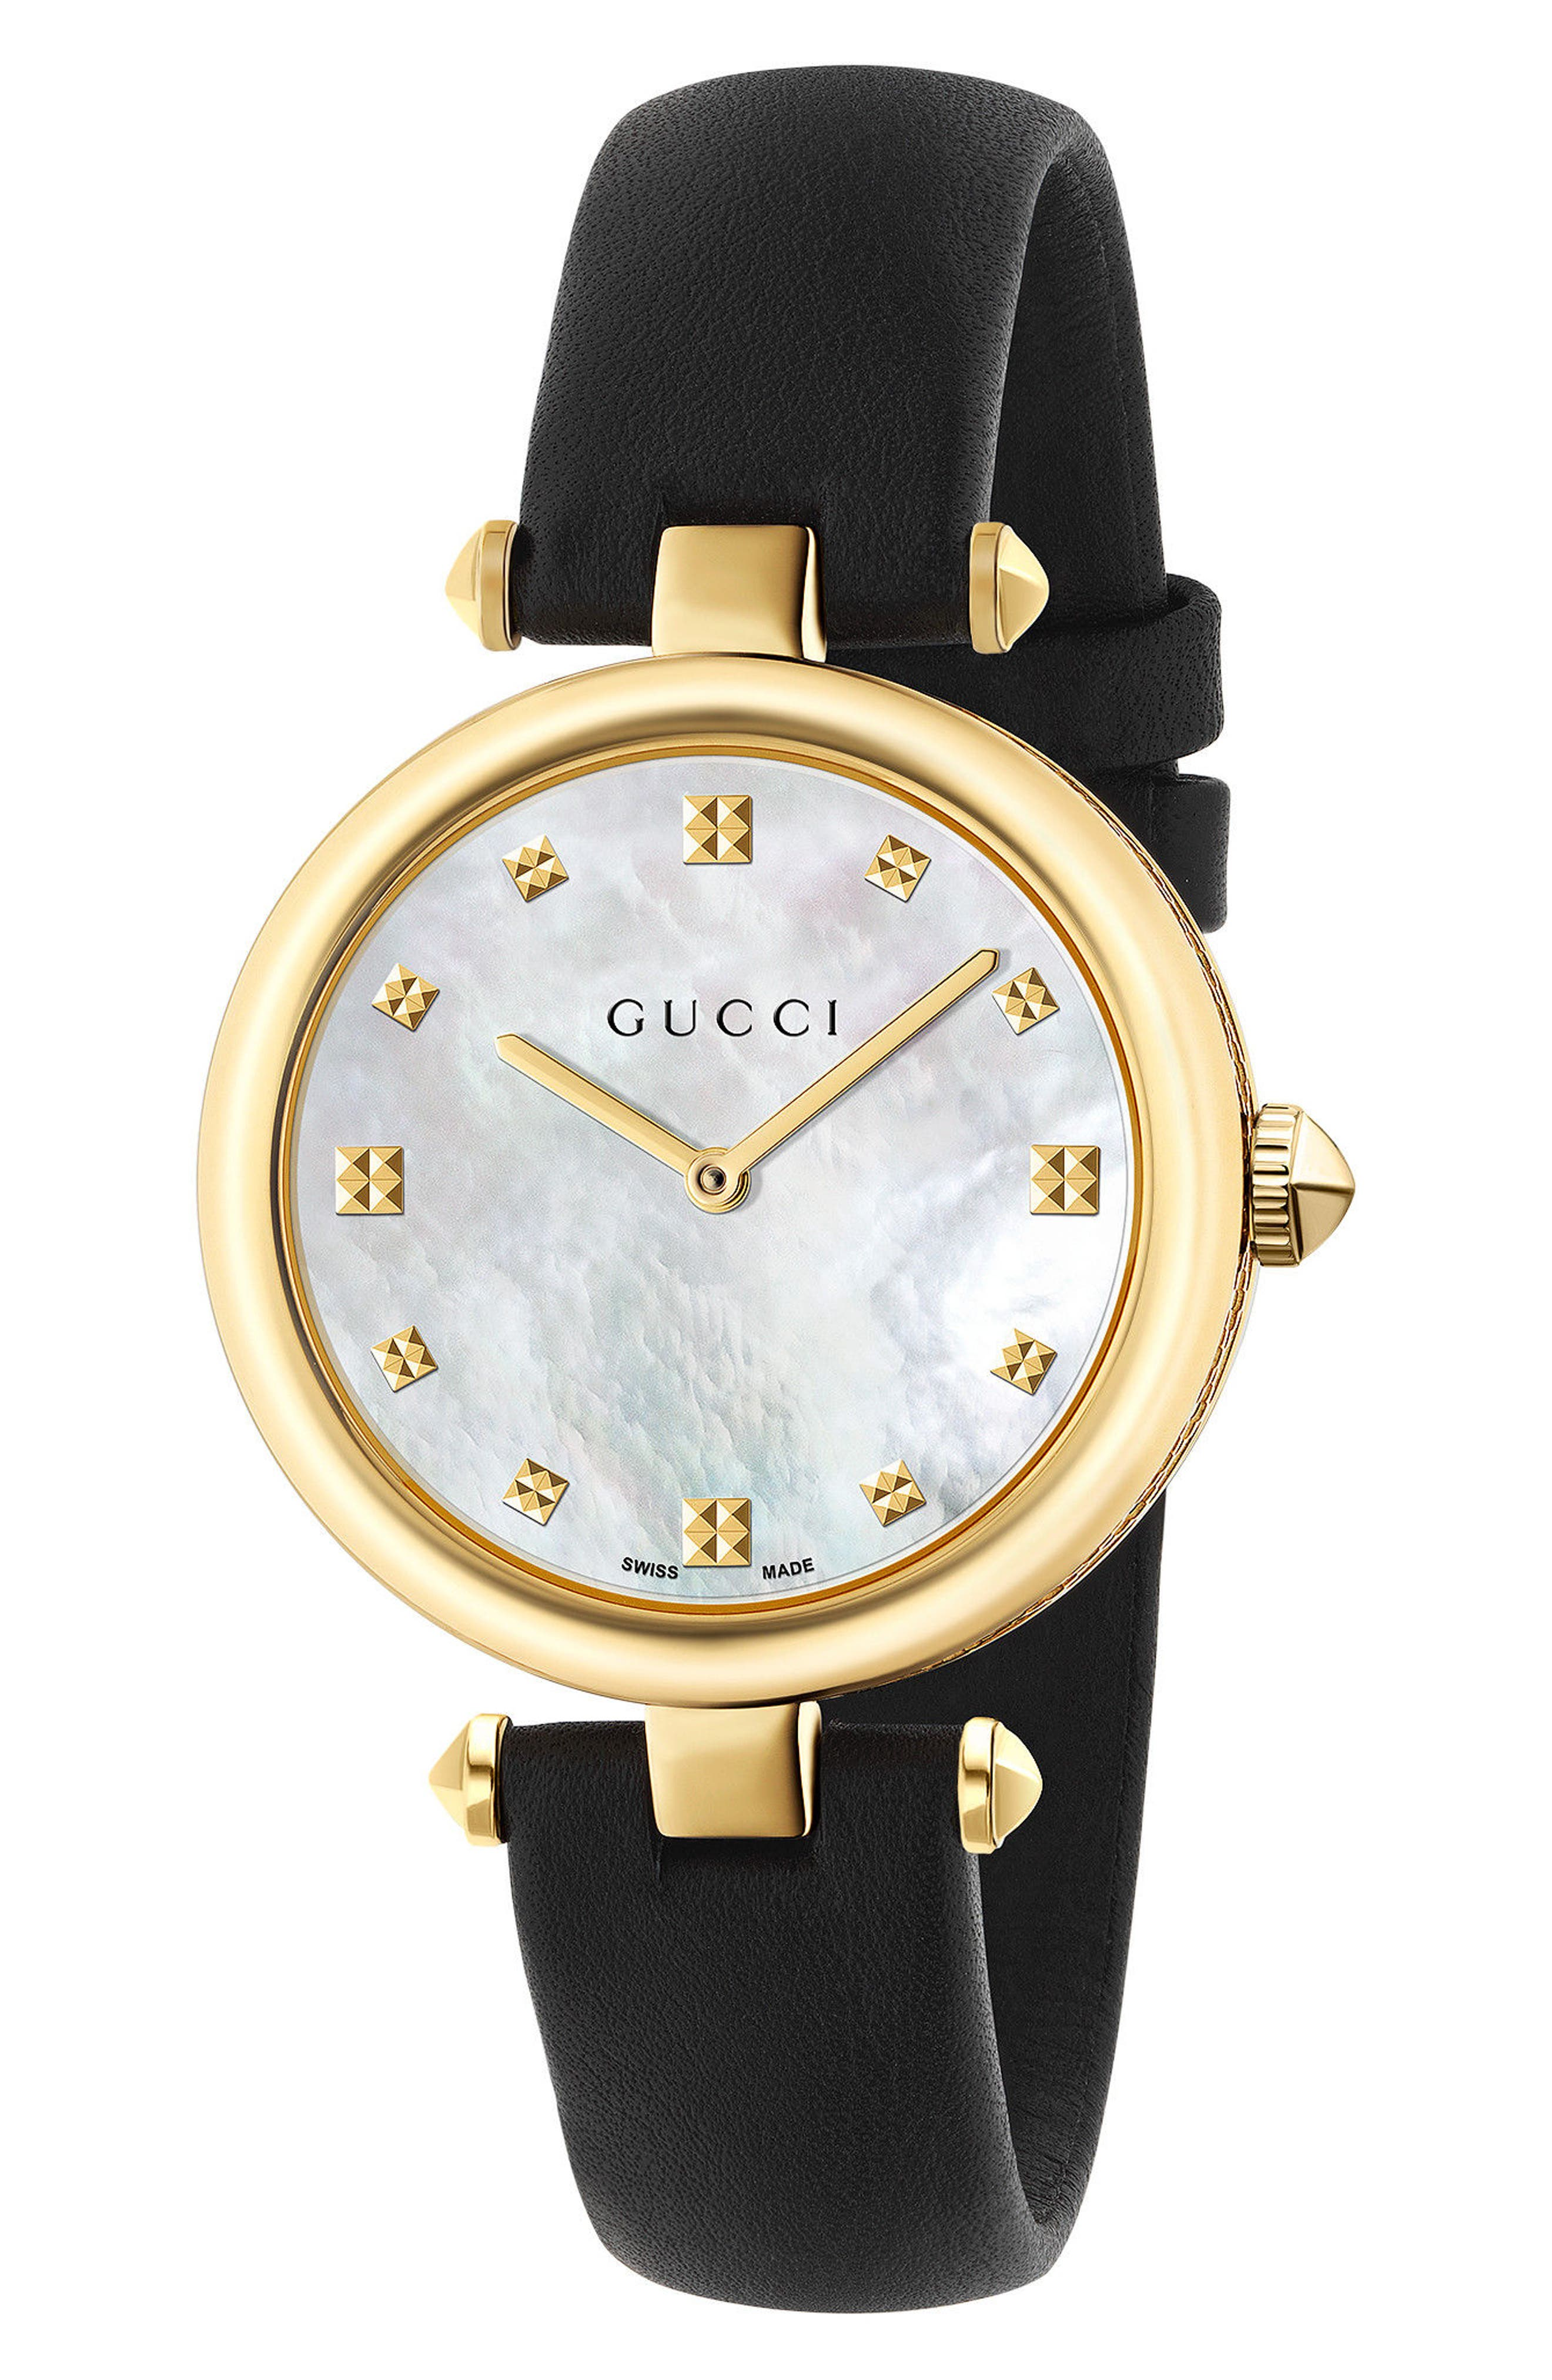 GUCCI, Diamantissima Leather Strap Watch, 32mm, Main thumbnail 1, color, BLACK/ MOP/ GOLD